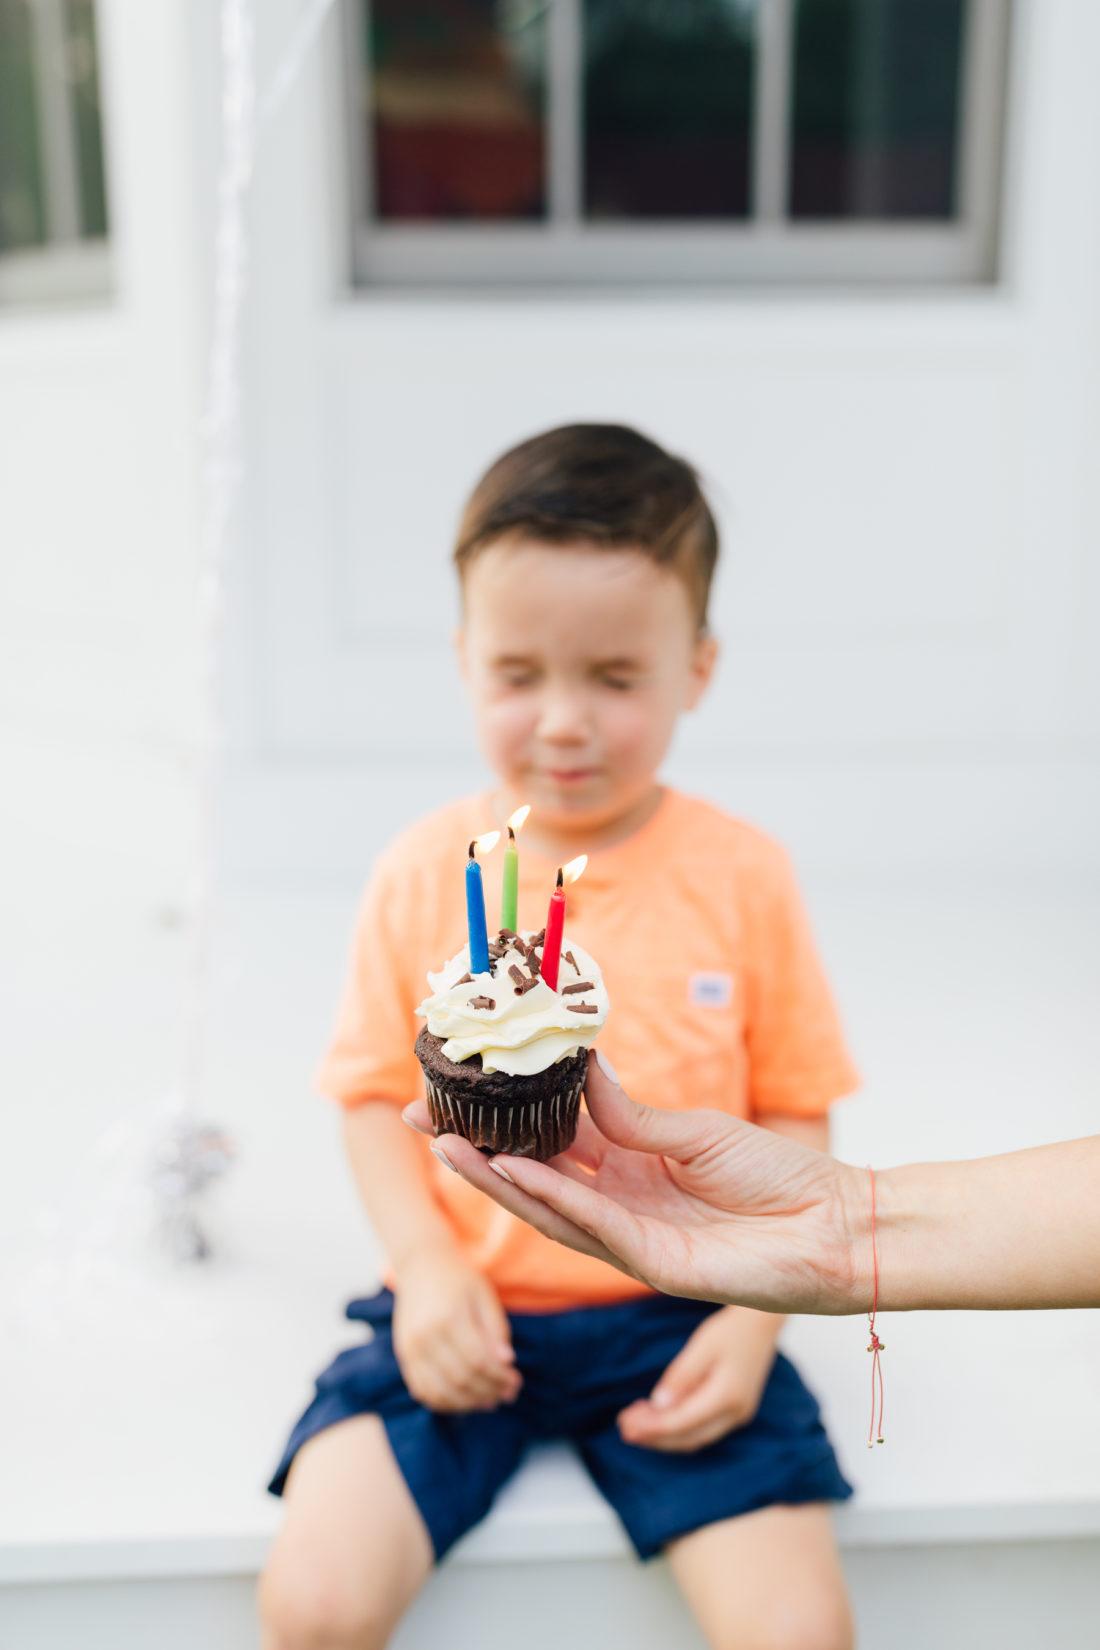 Eva Amurri Martino's son Major blows out the candles on his birthday cupcake